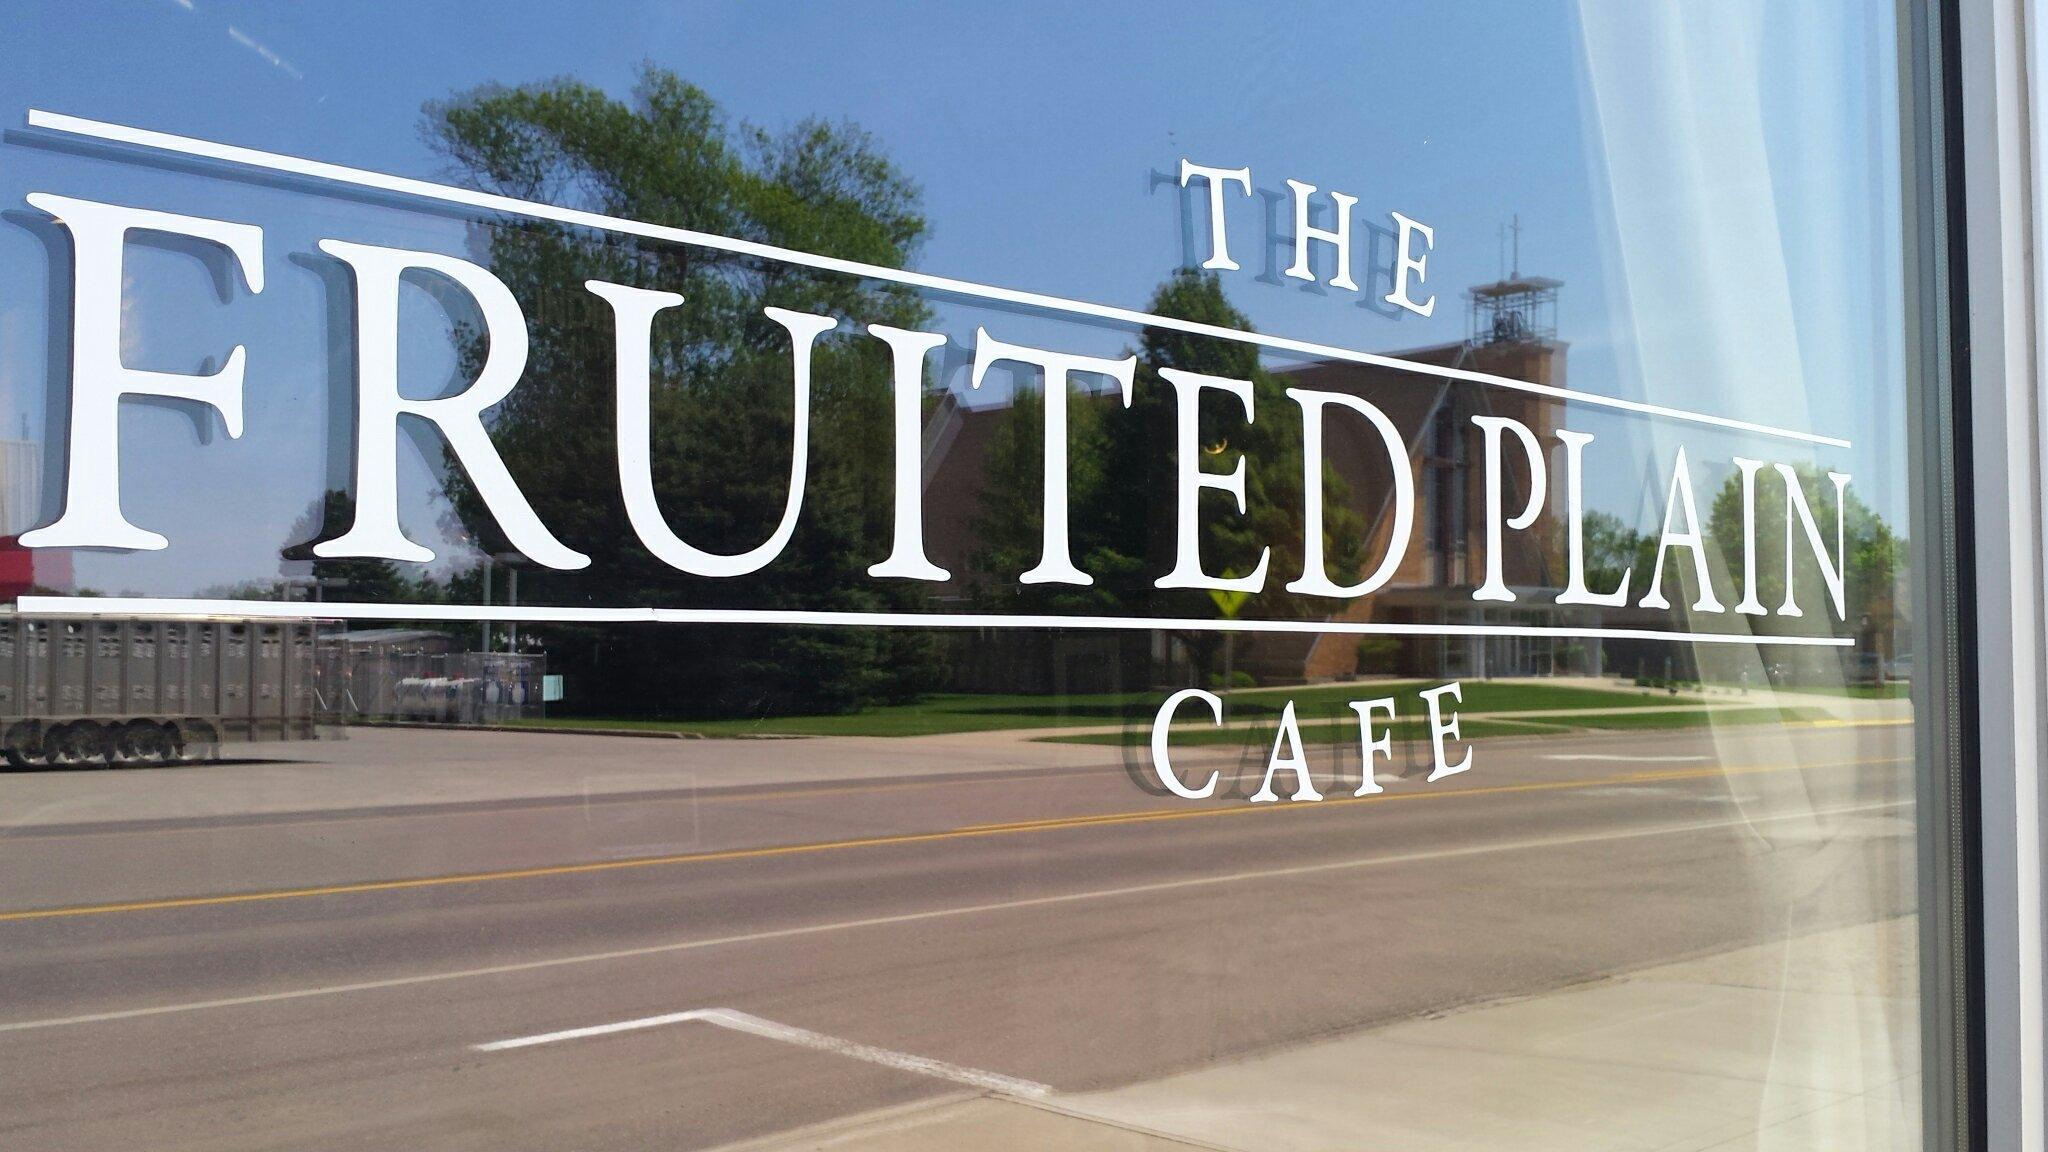 The Fruited Plain Cafe